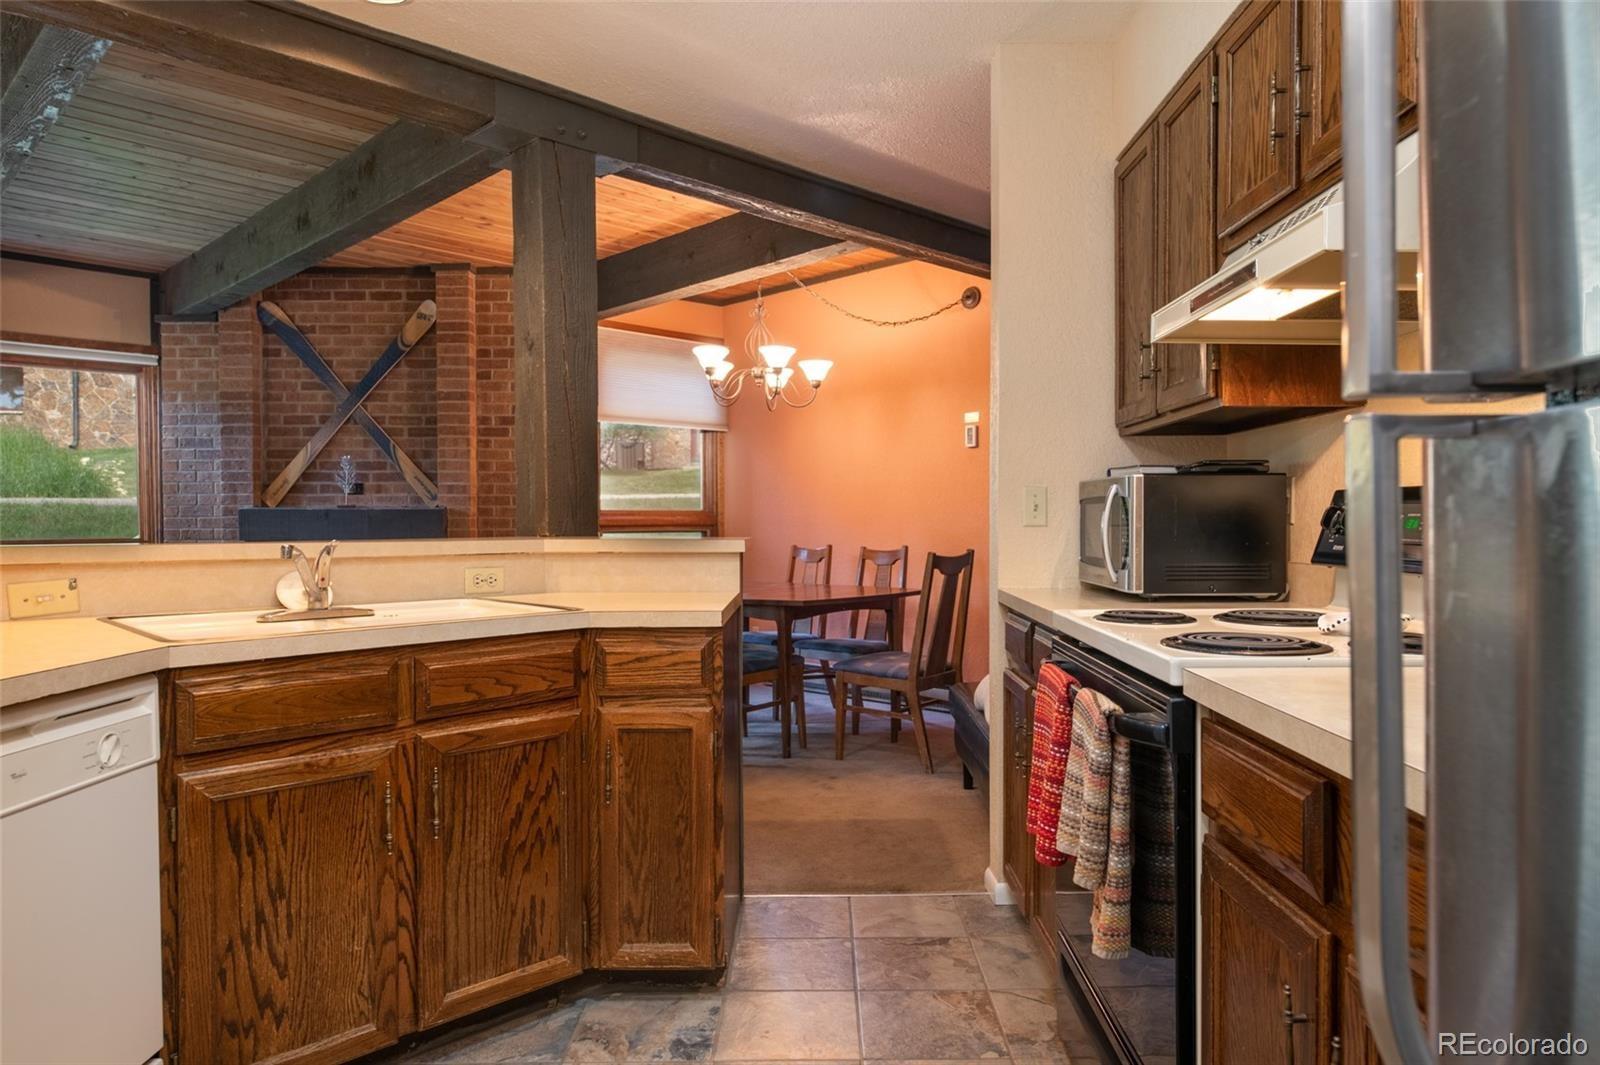 MLS# 6498865 - 6 - 2700 Village Drive #105, Steamboat Springs, CO 80487